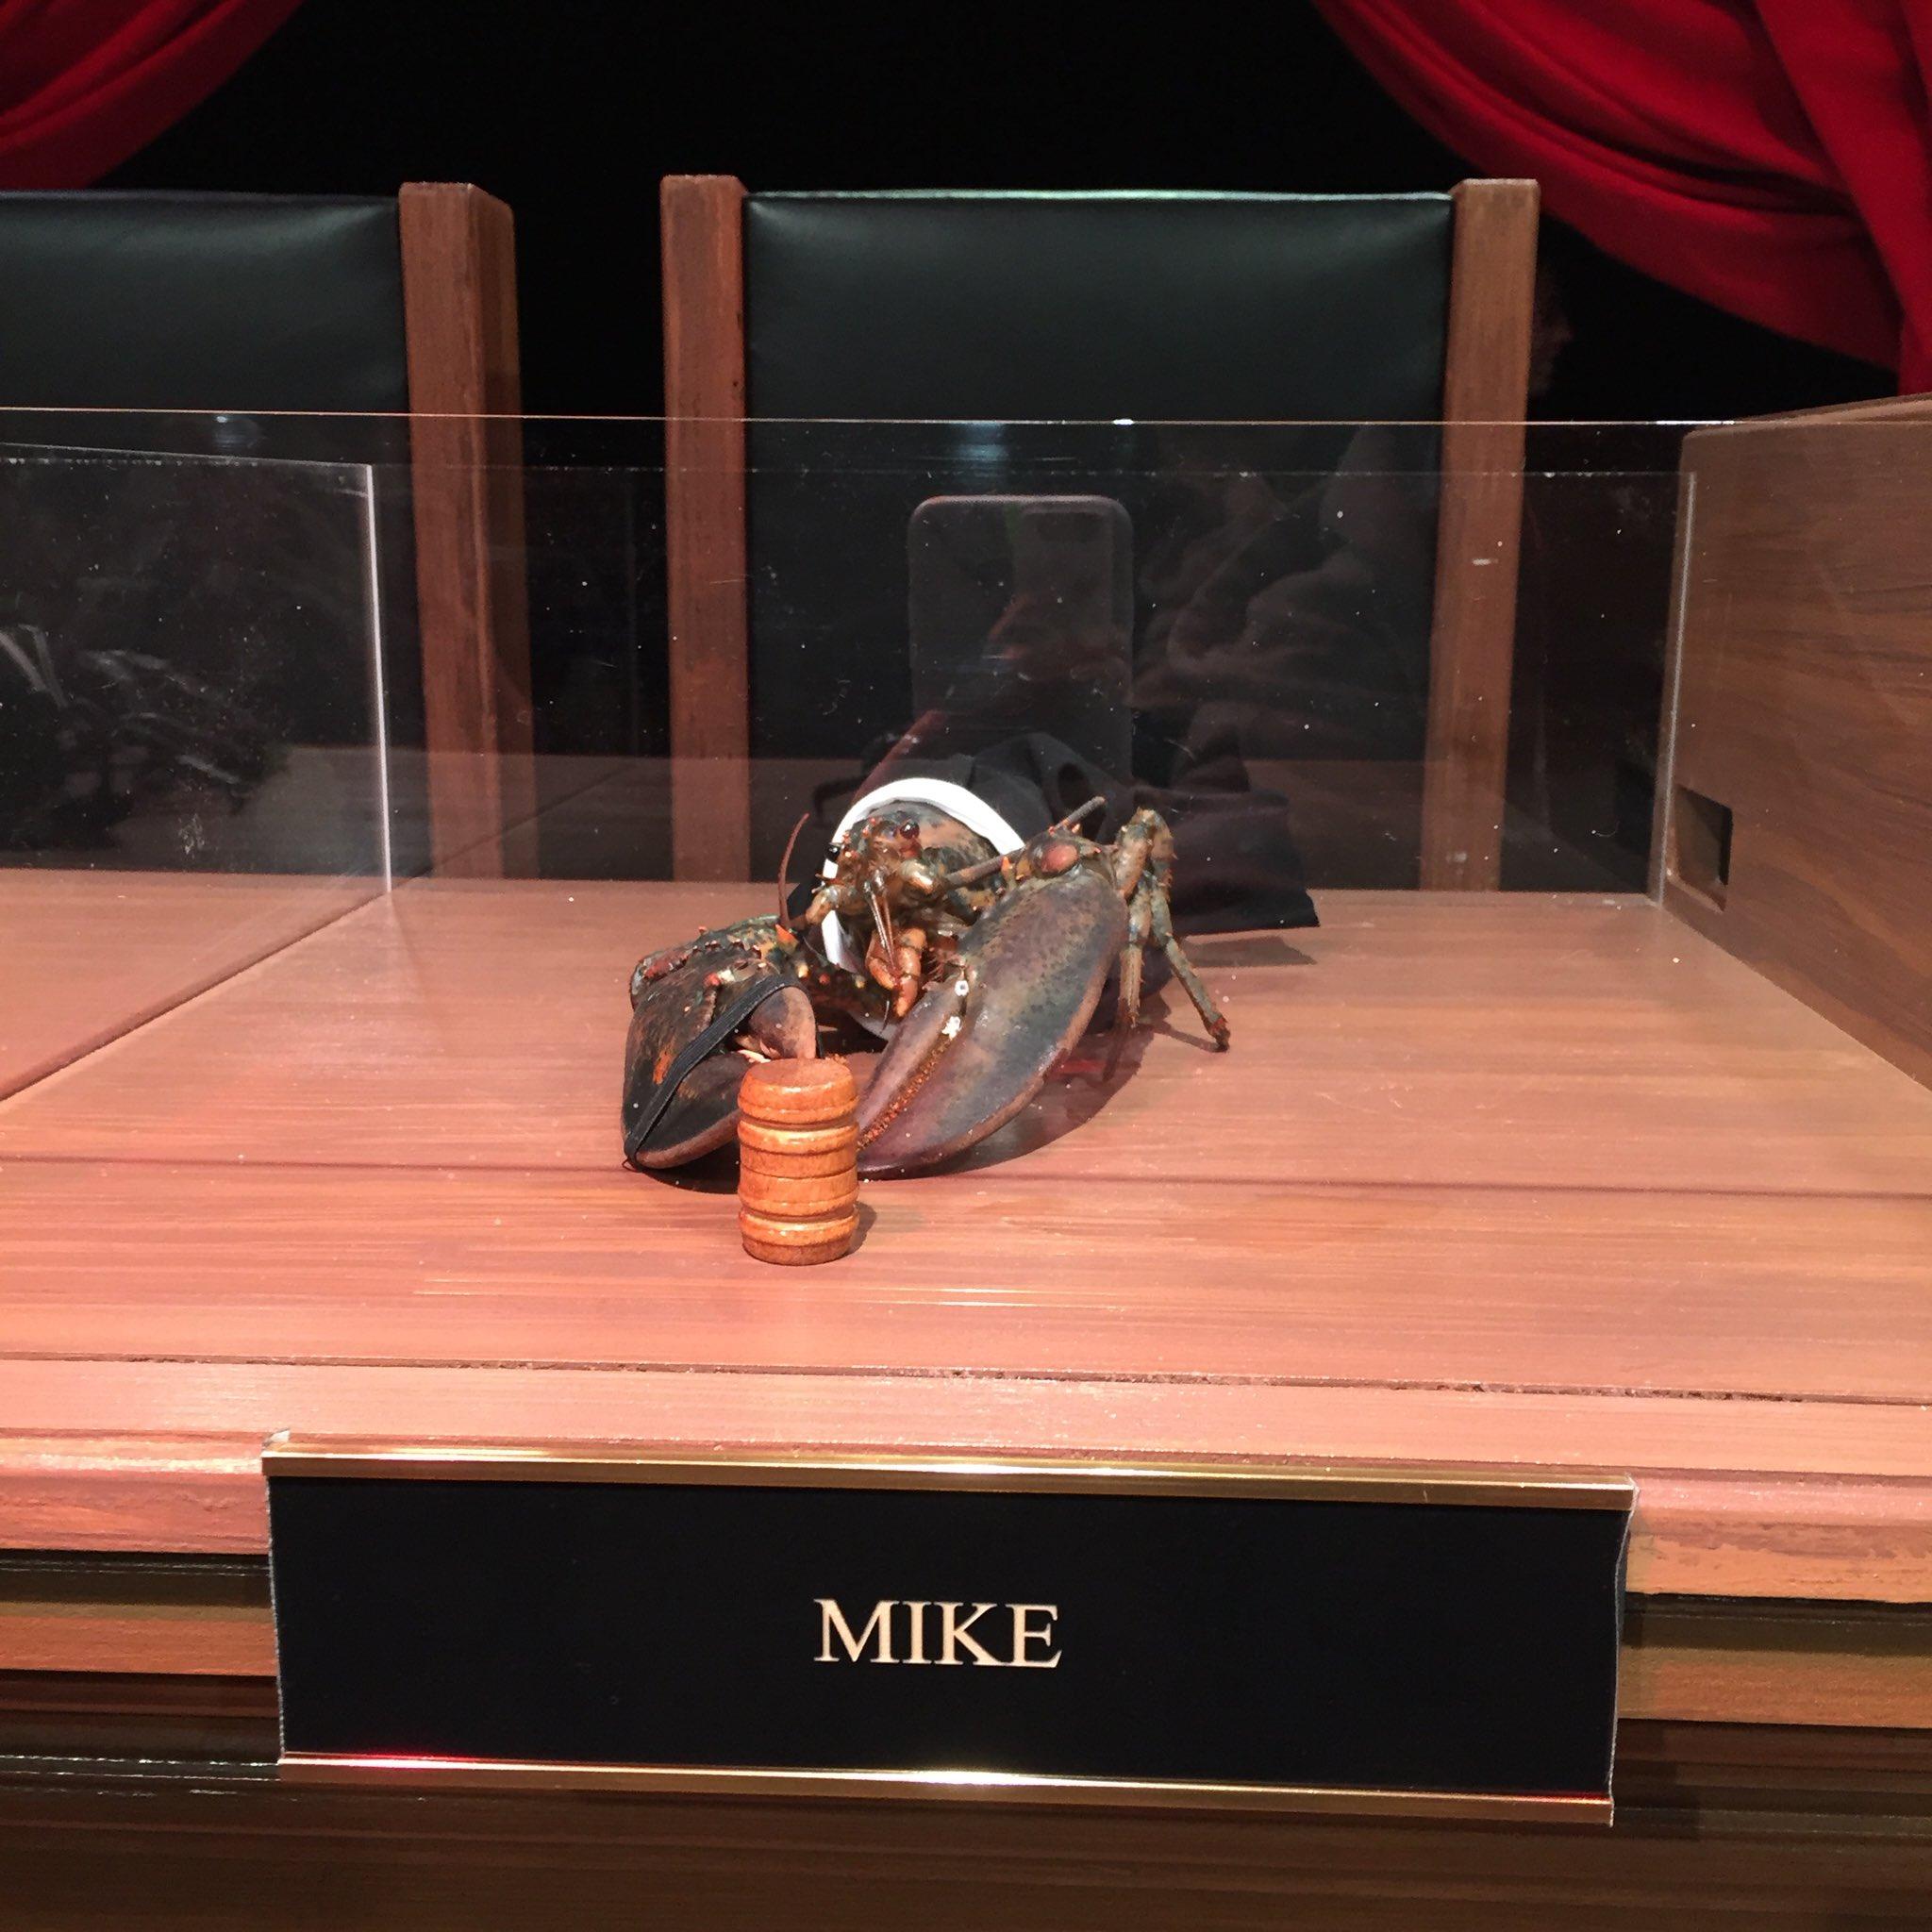 Mike! #ClawAndOrder https://t.co/xN0zhcFmpE